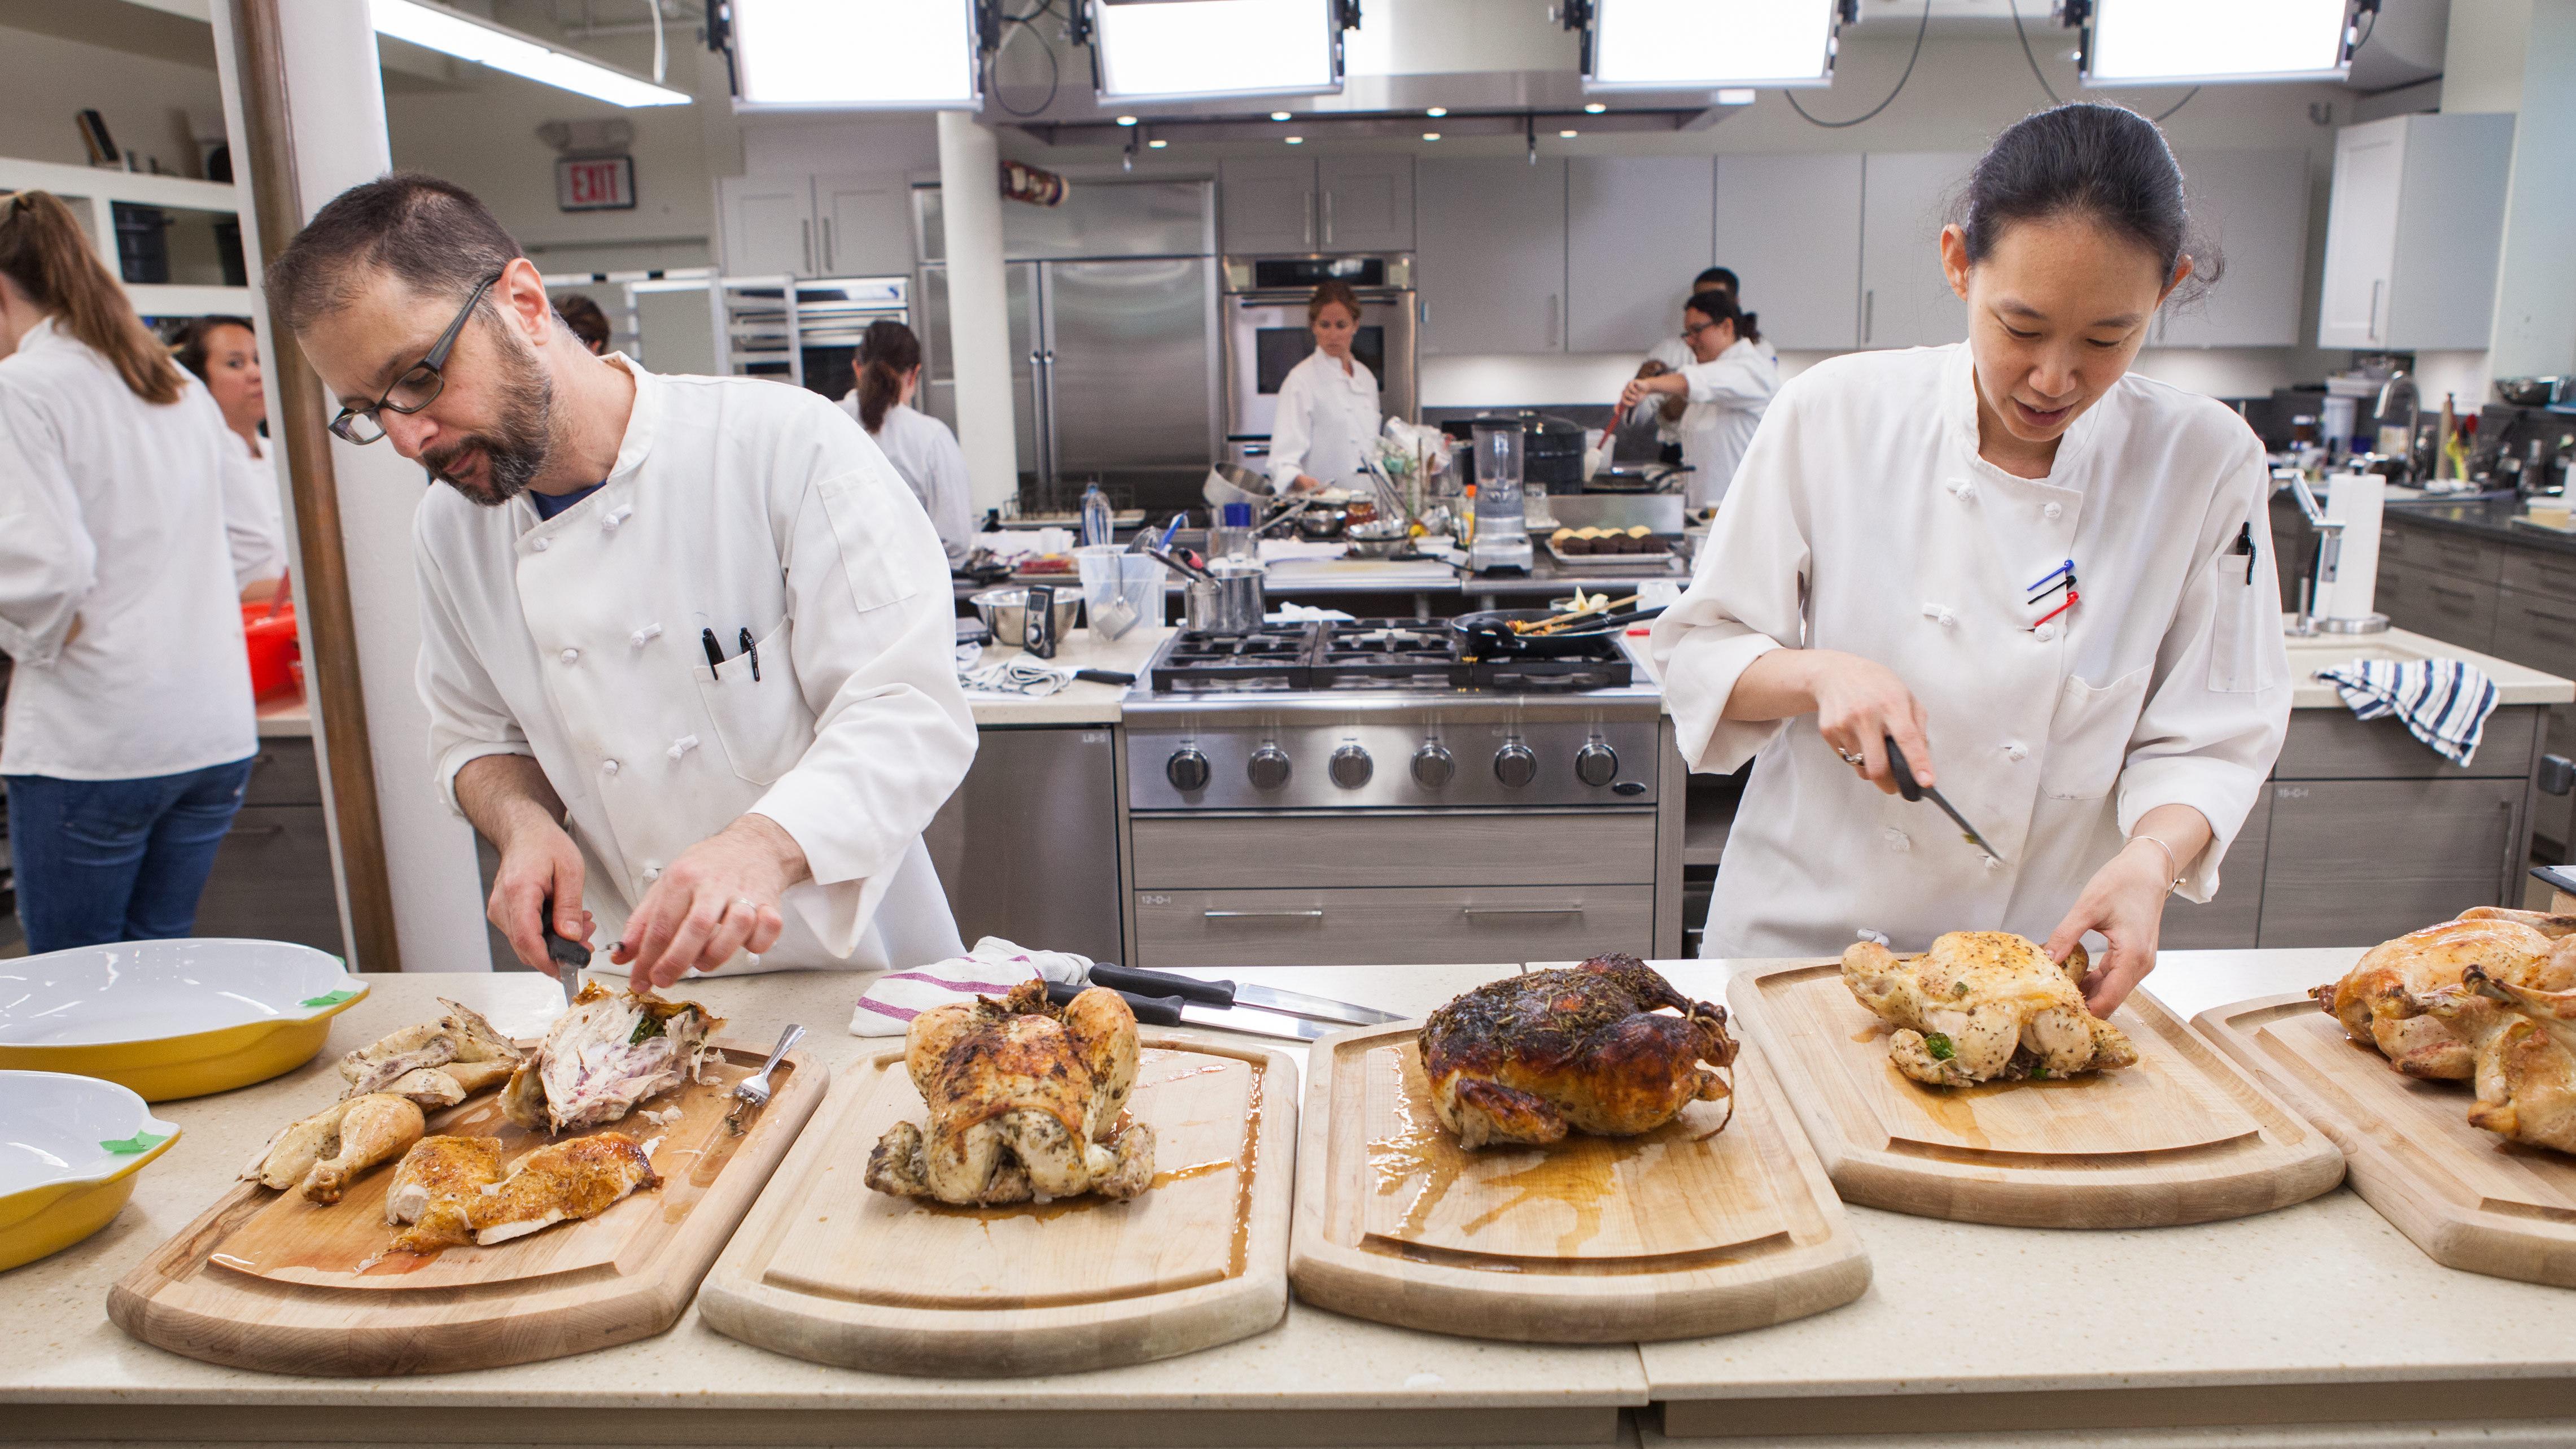 America's Test Kitchen is taking its rigorous recipe